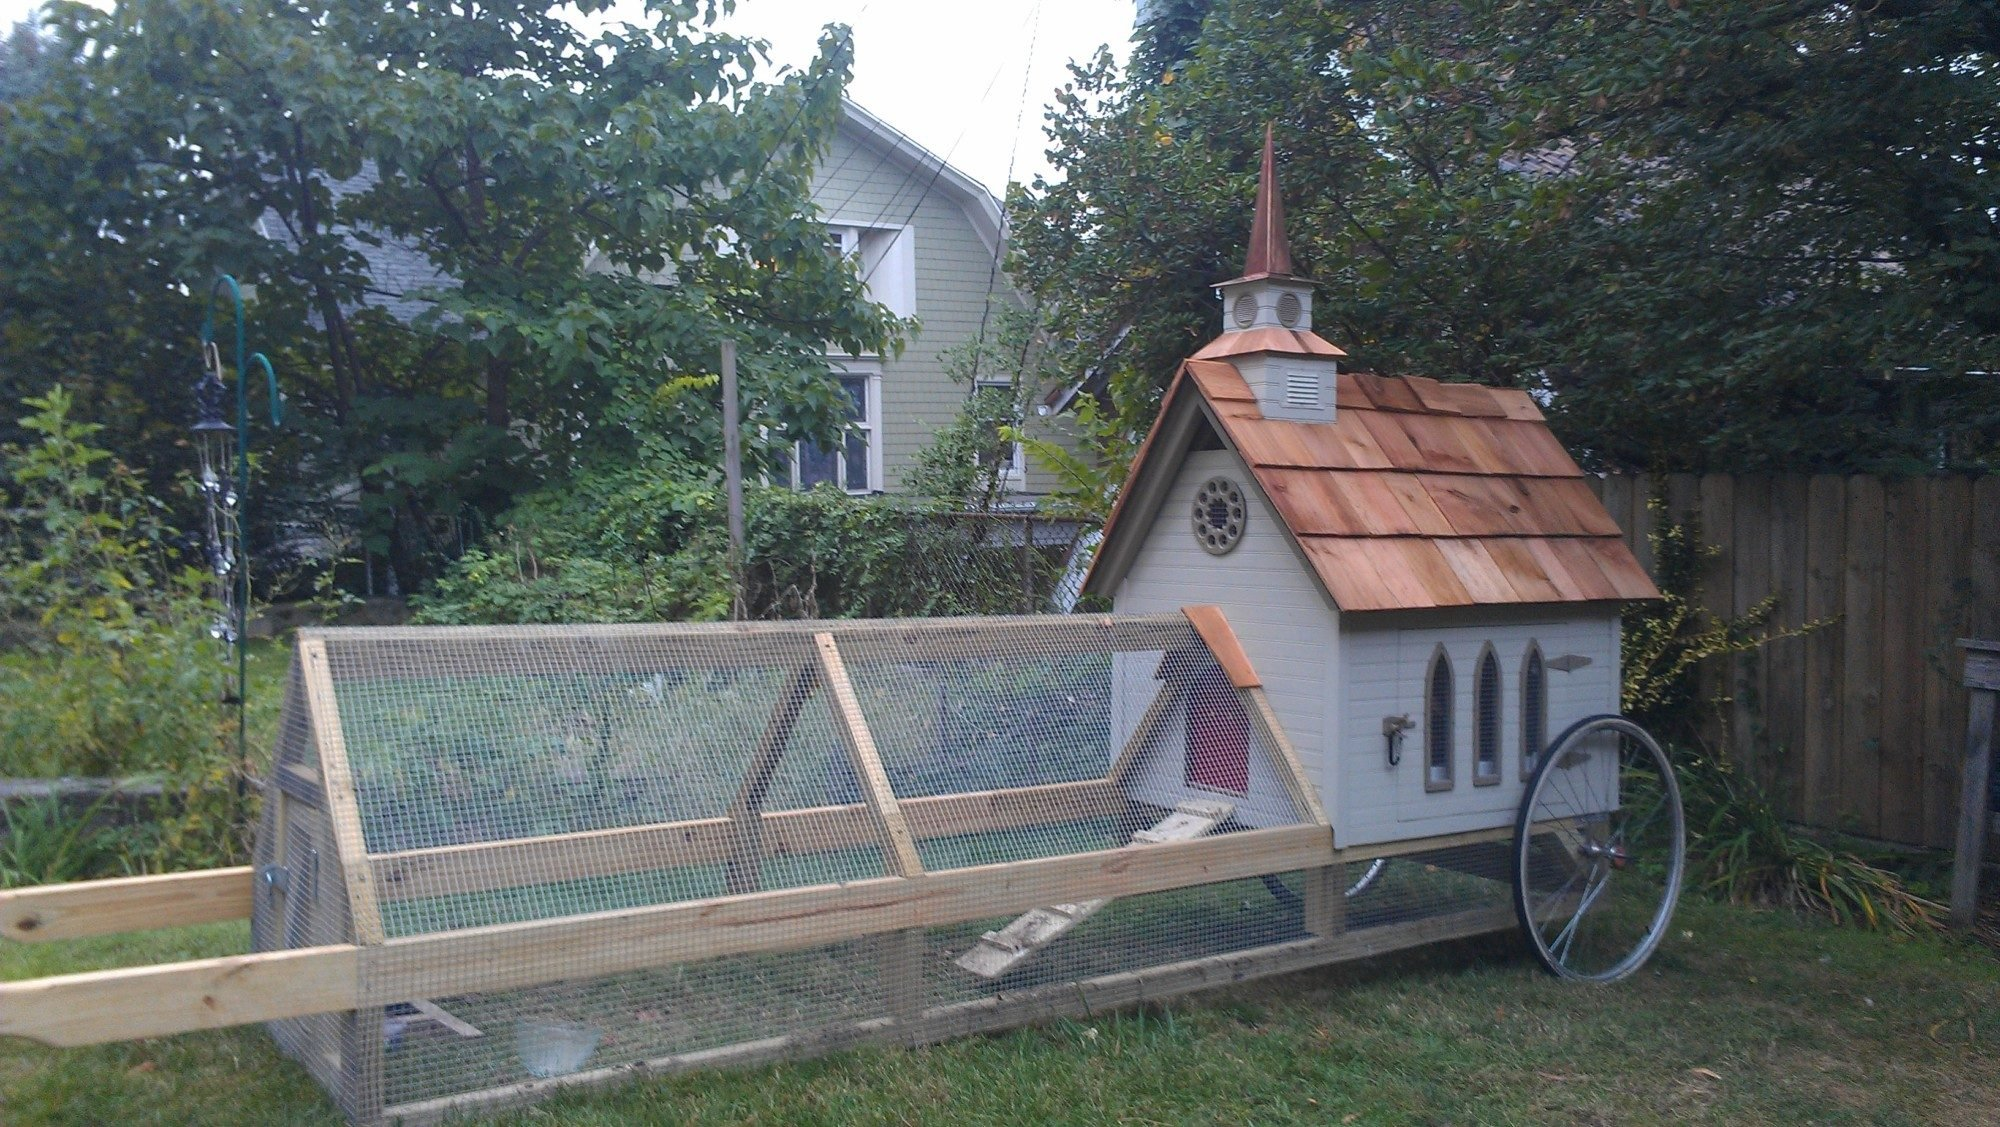 The Wee Kirk Coop Backyard Chickens Community